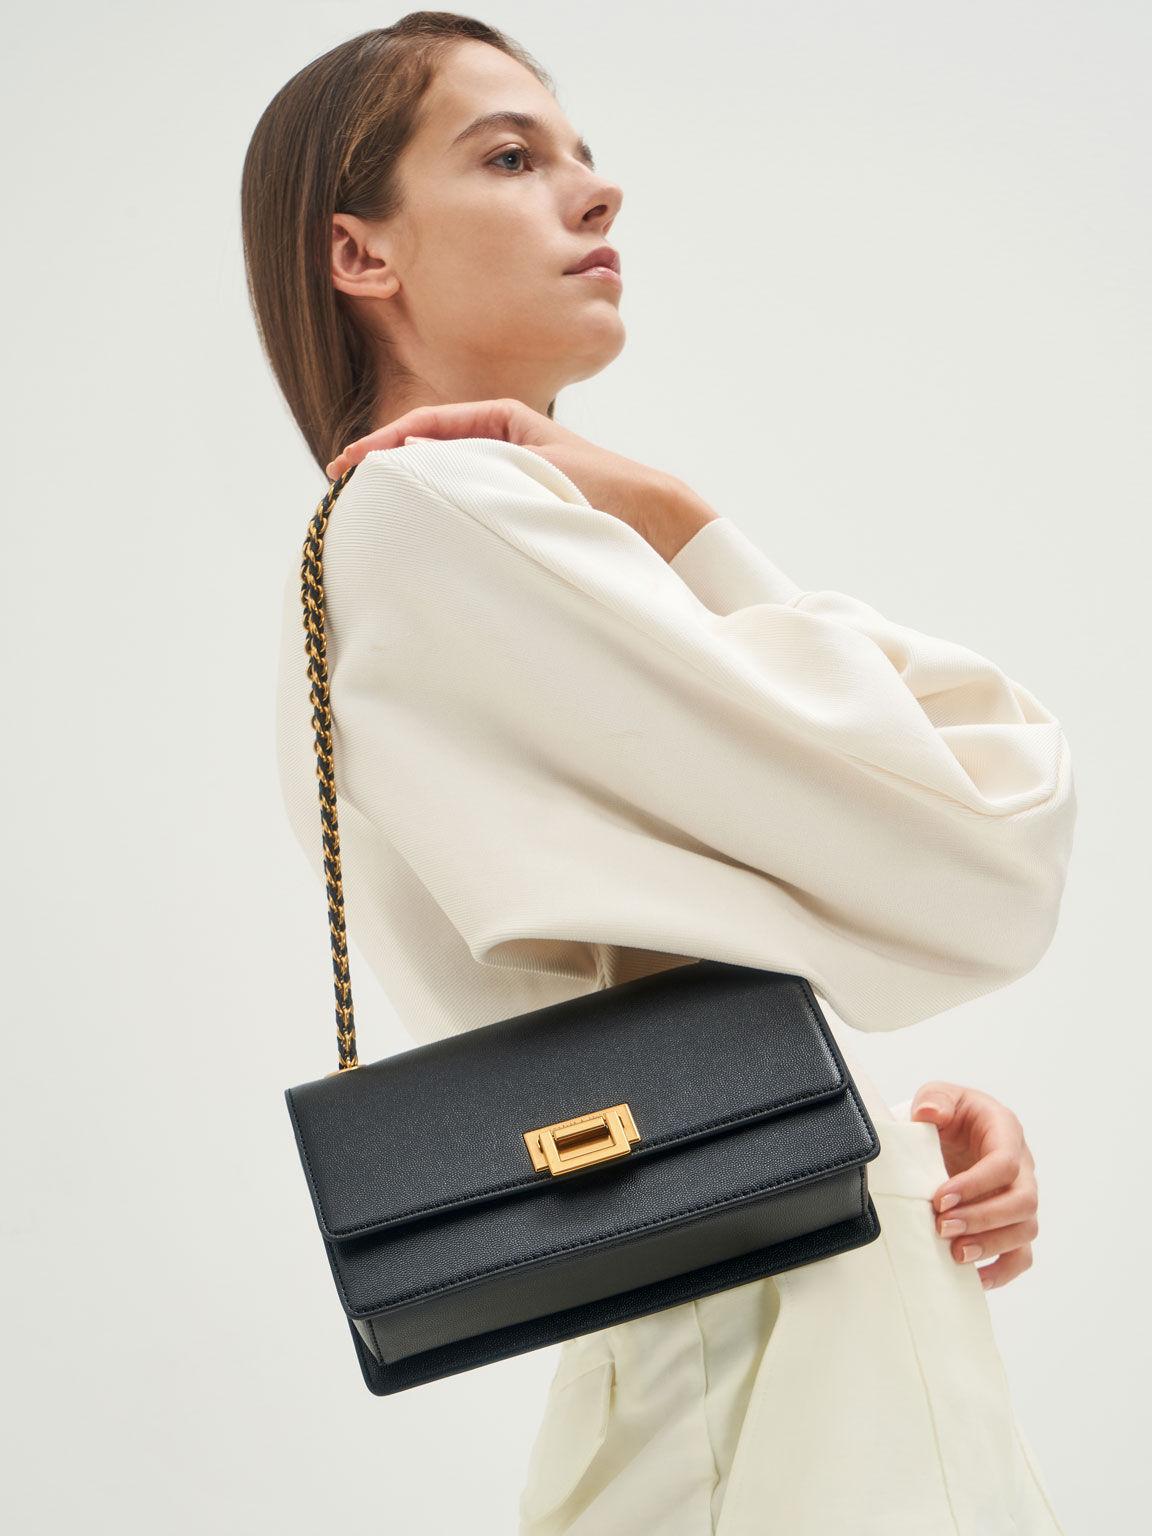 Chain Strap Evening Bag, Black, hi-res